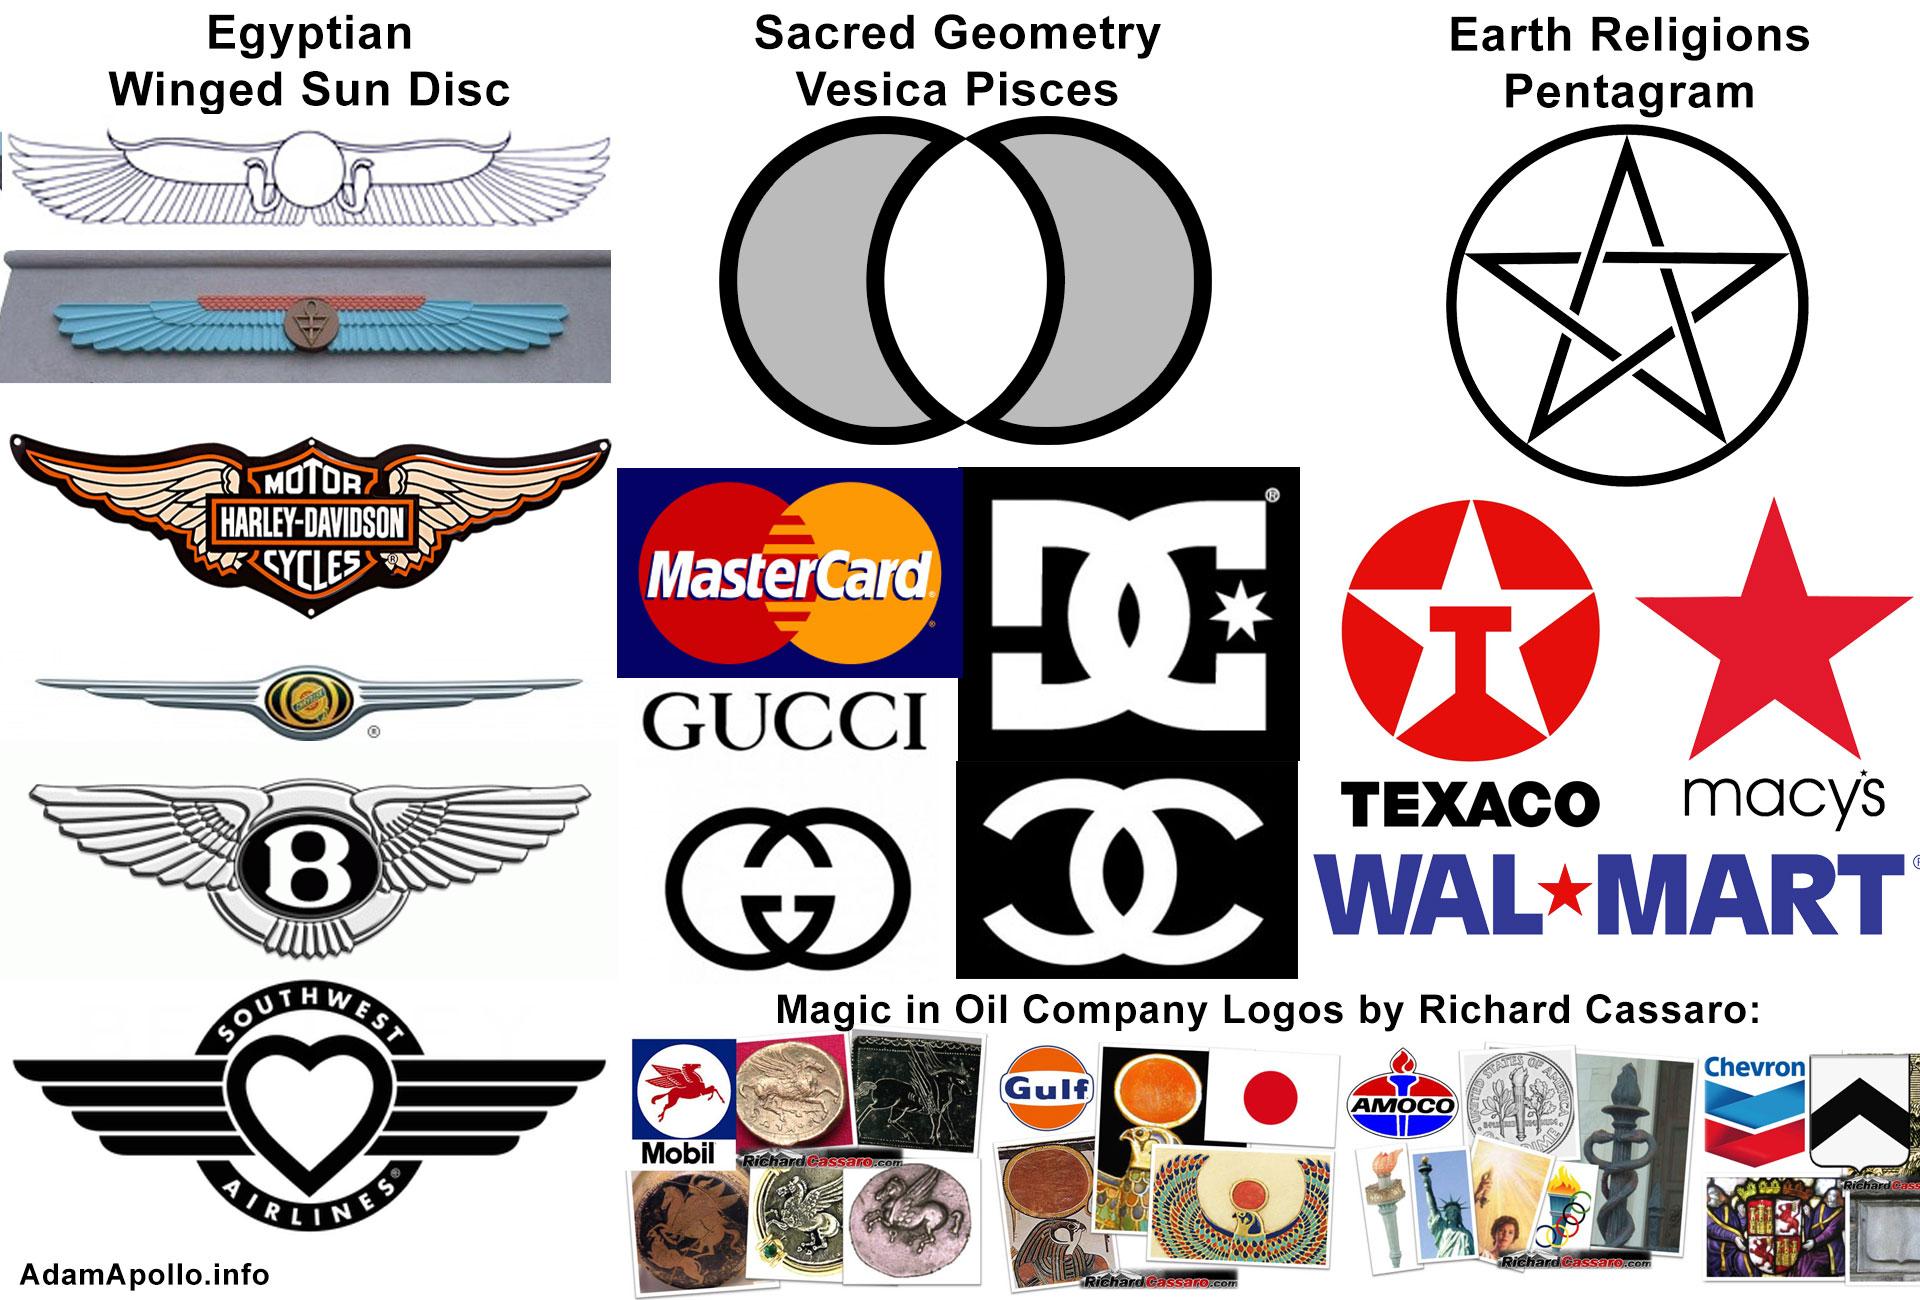 Magical Symbols in Corporate Logos